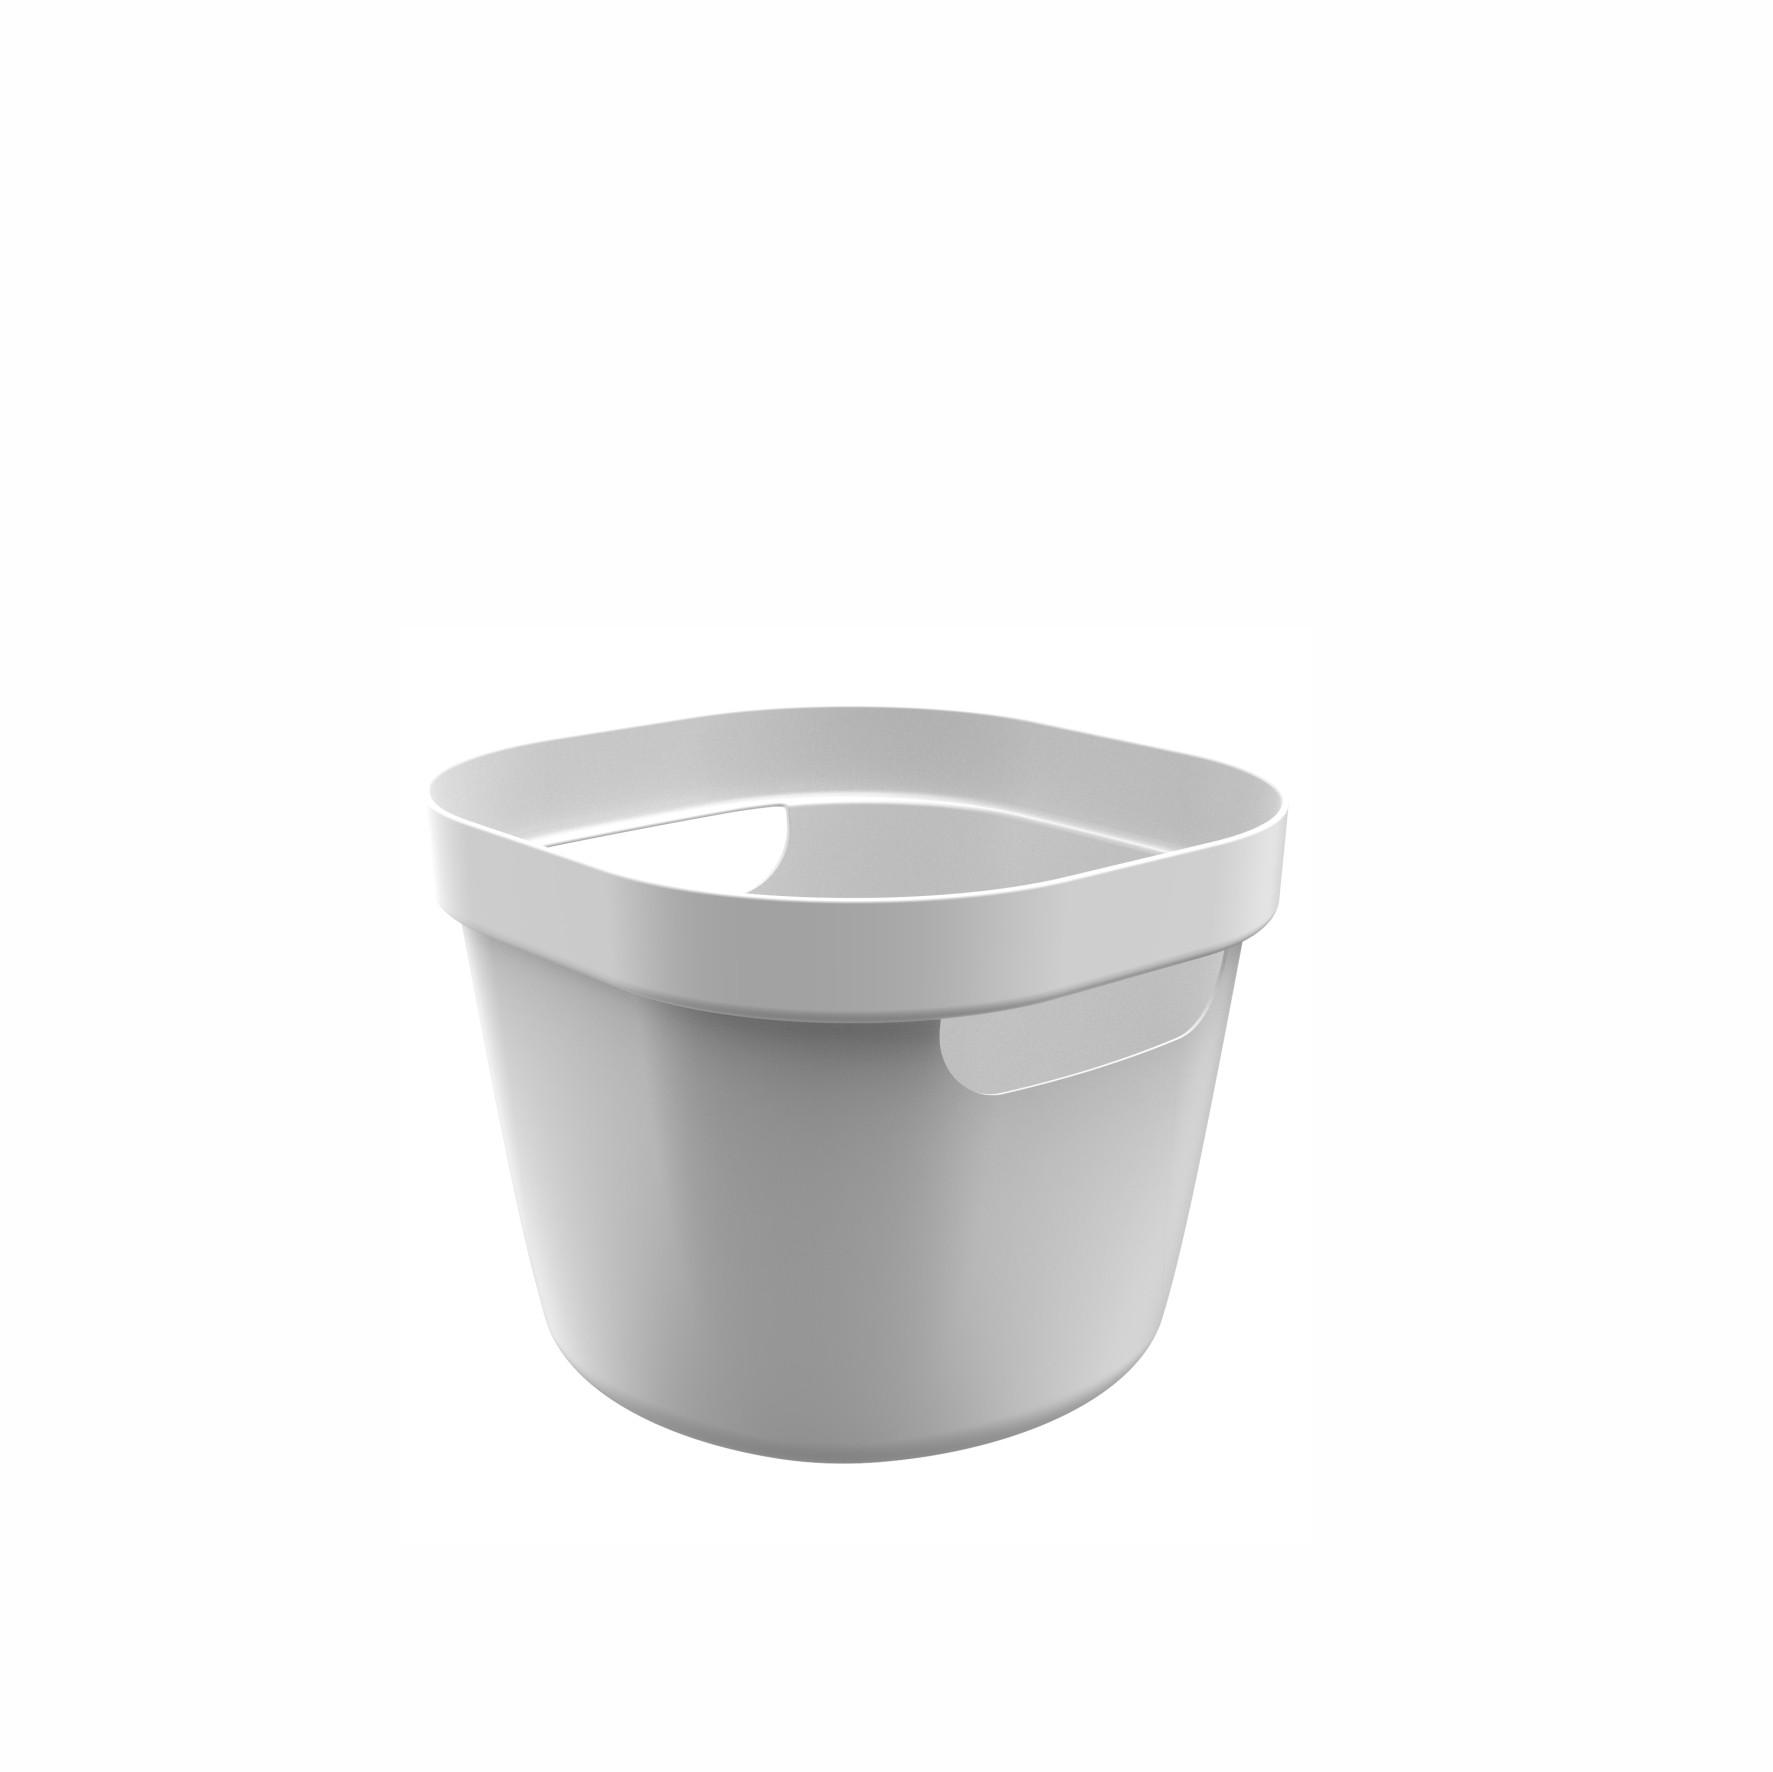 Cesto Organizador 4L Cube Flex Branco - OU